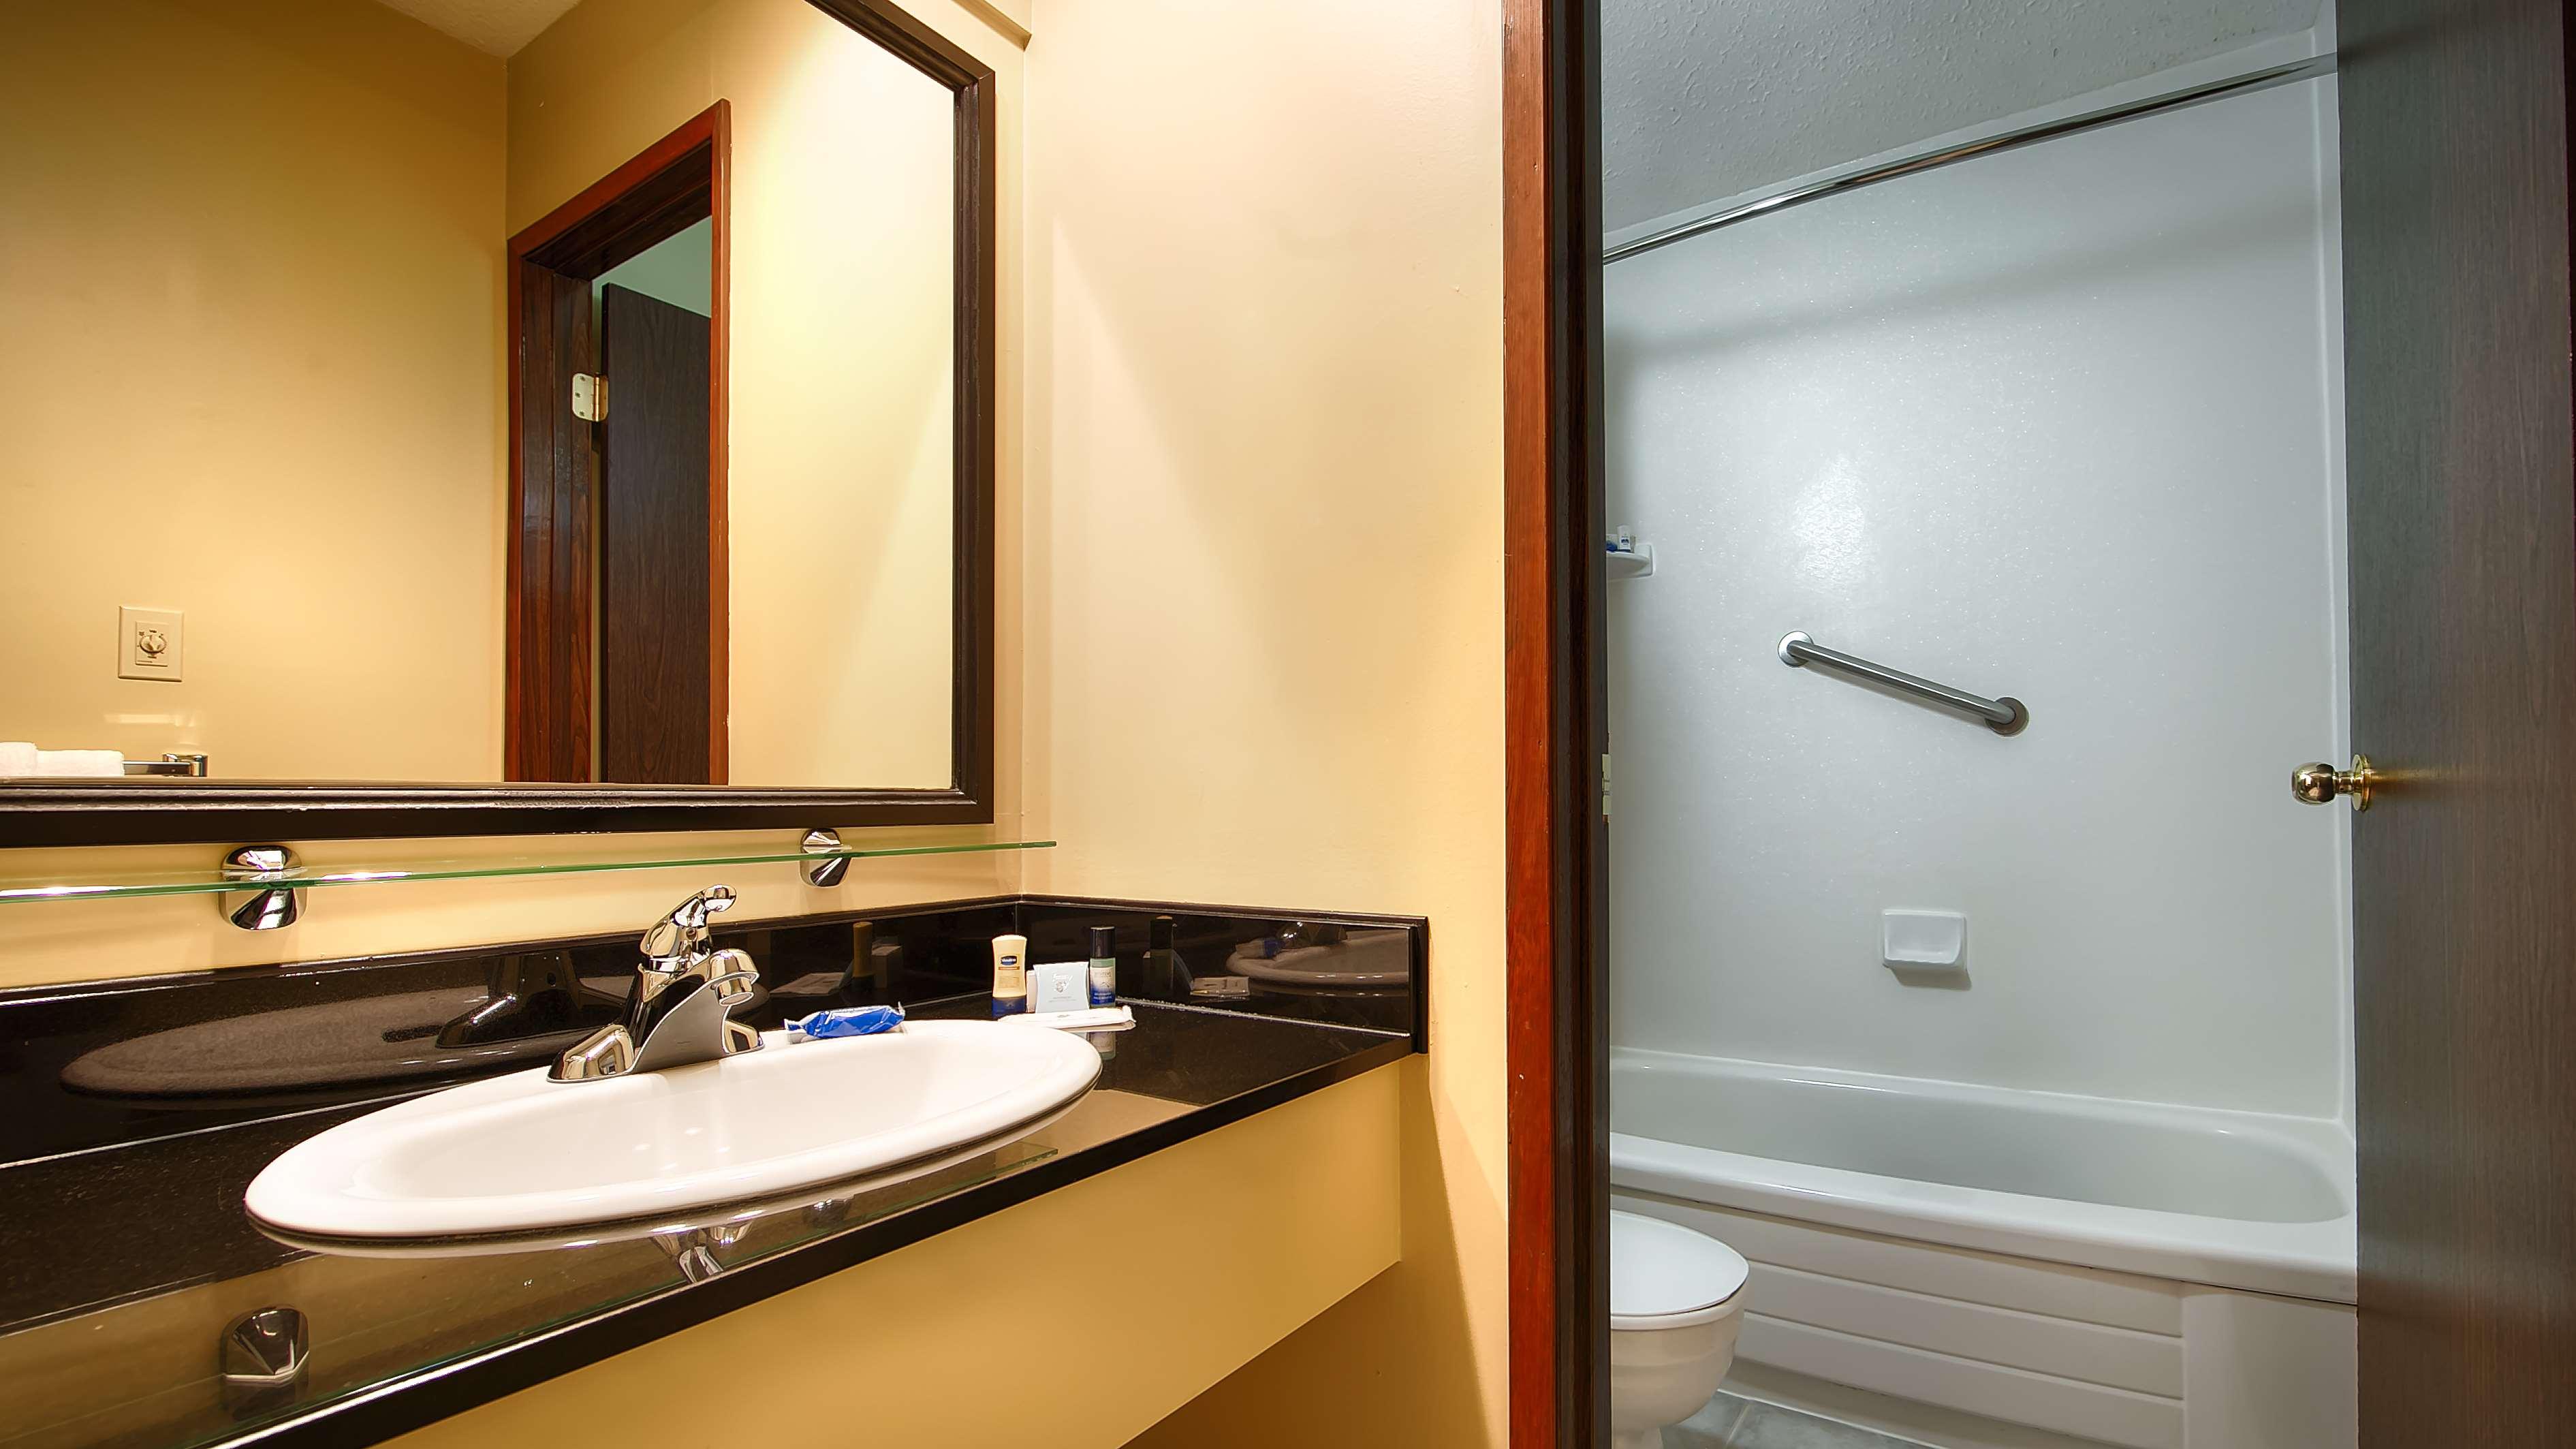 Best Western Bakerview Inn in Abbotsford: Guest Bathroom